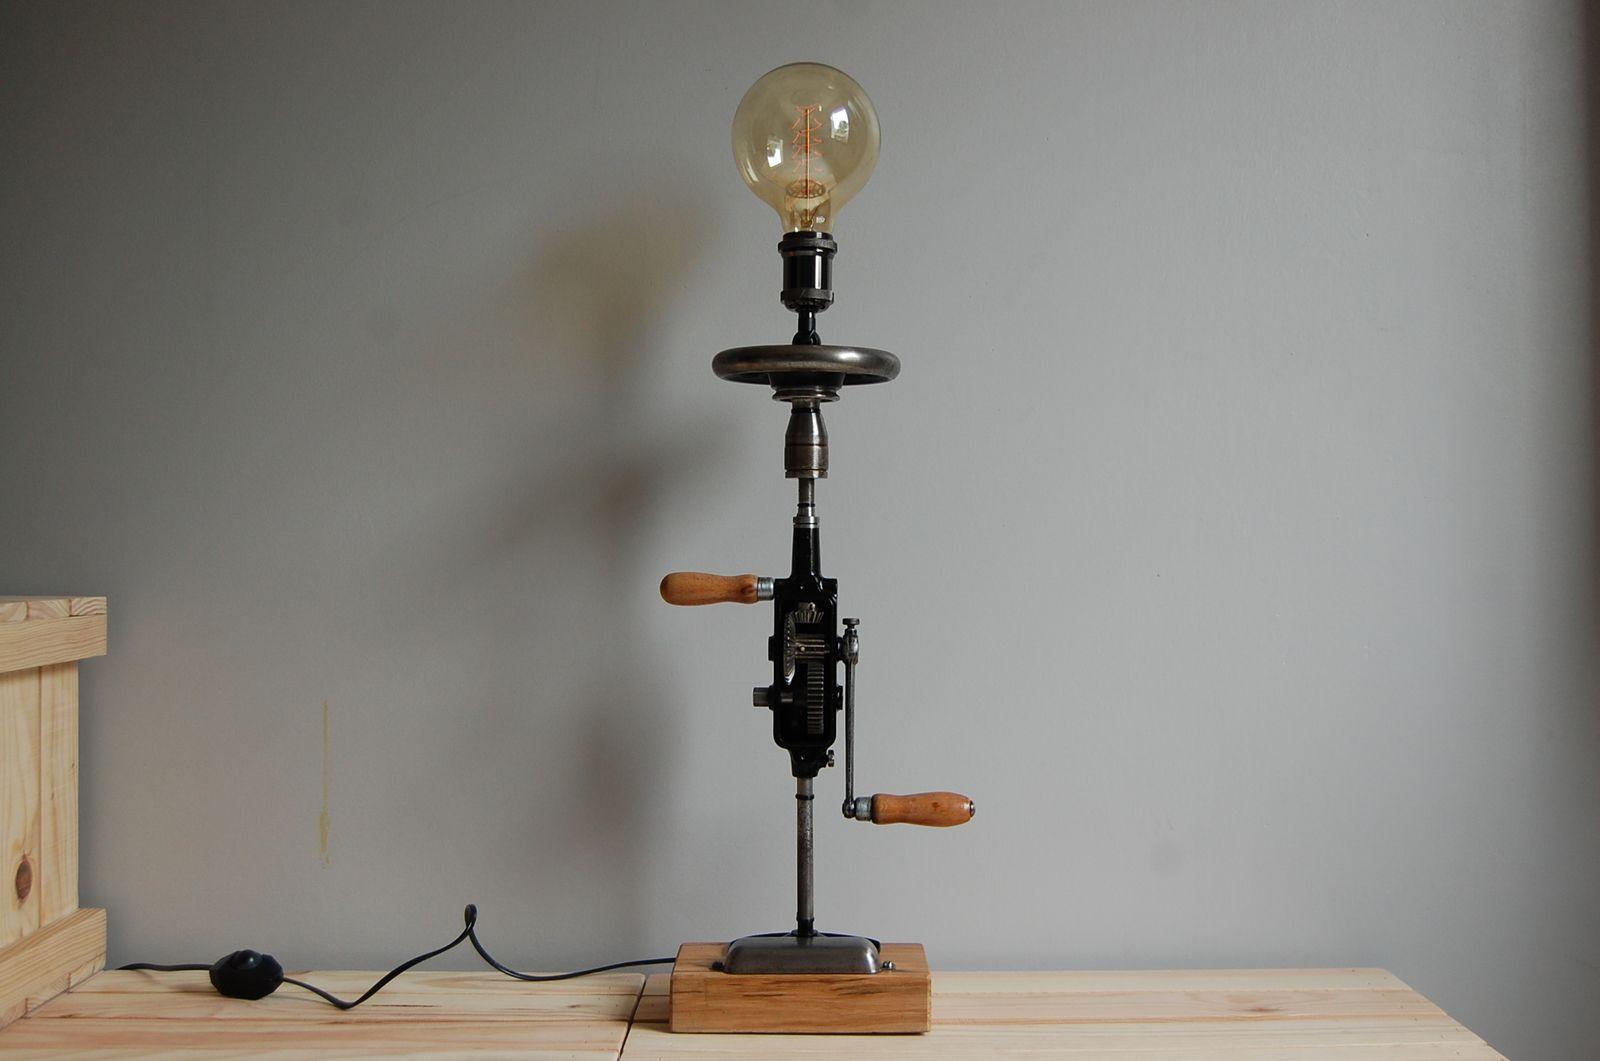 Lampe Chignole Peugeot (ancienne perceuse)